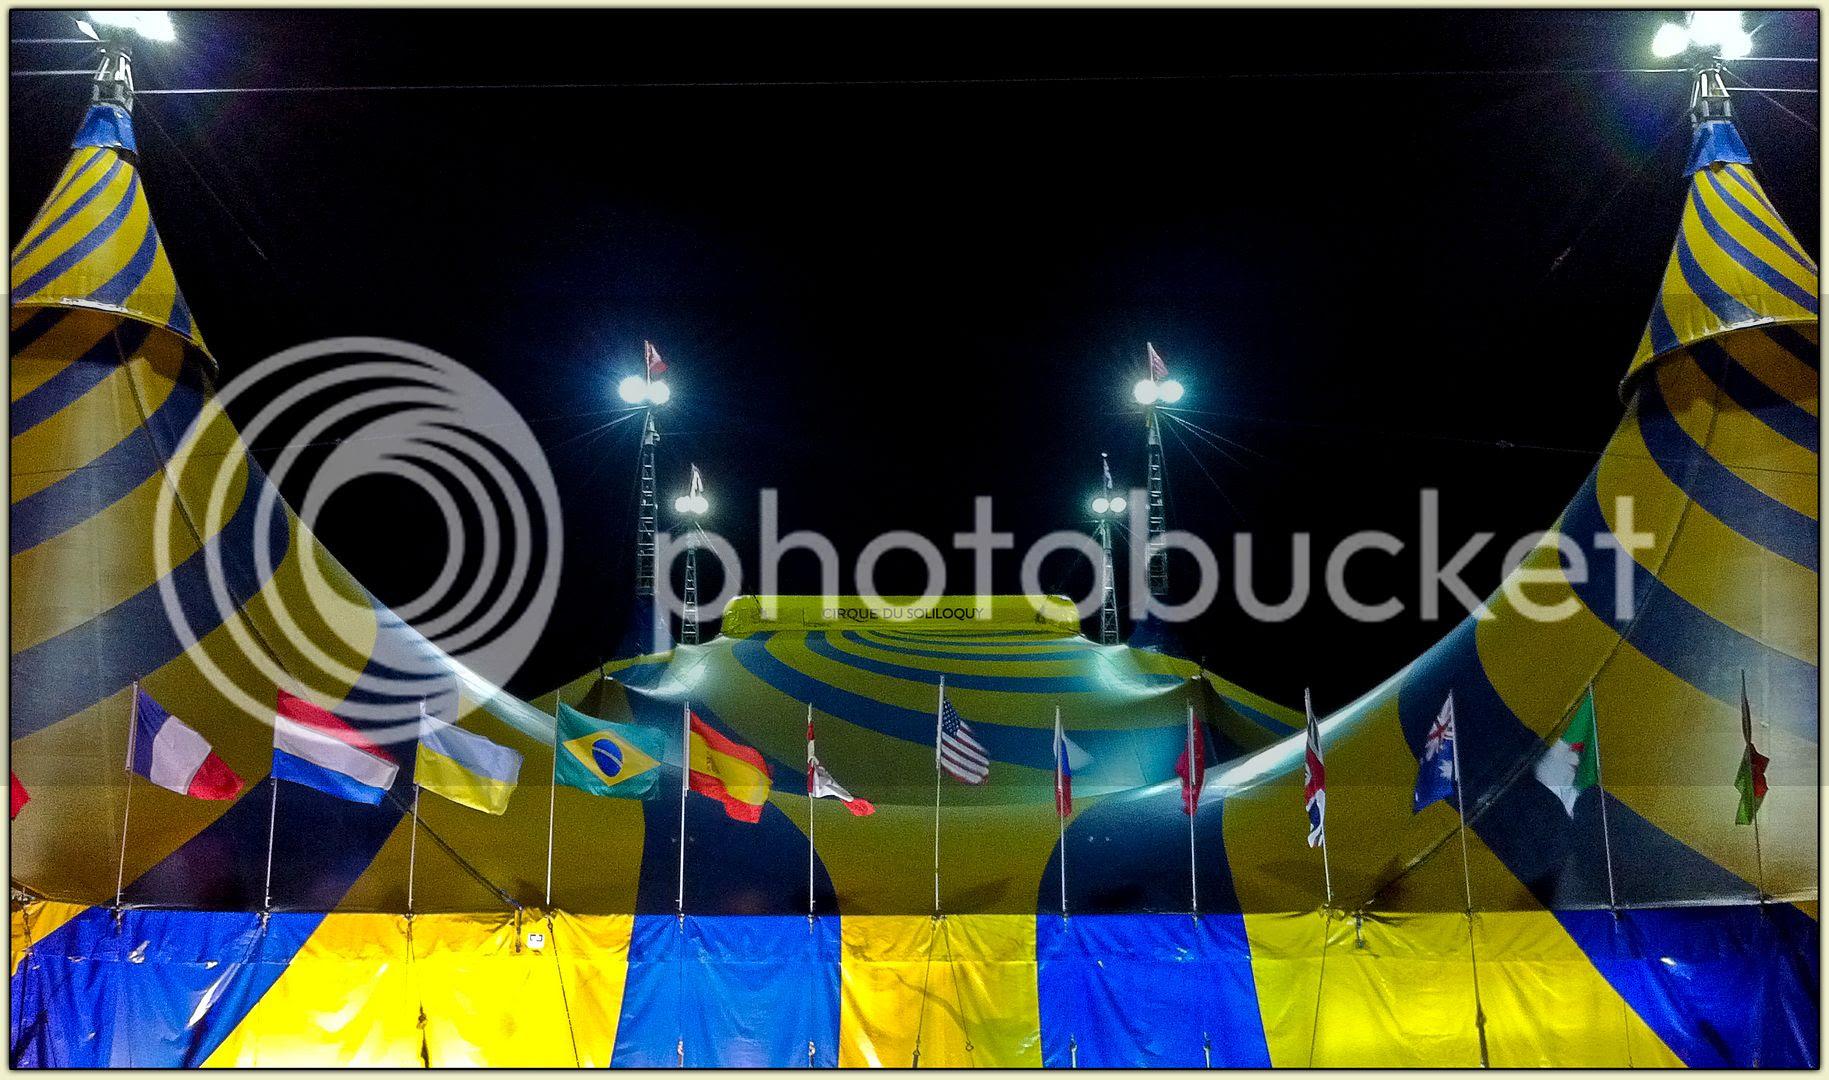 Cirque du Soliloquy